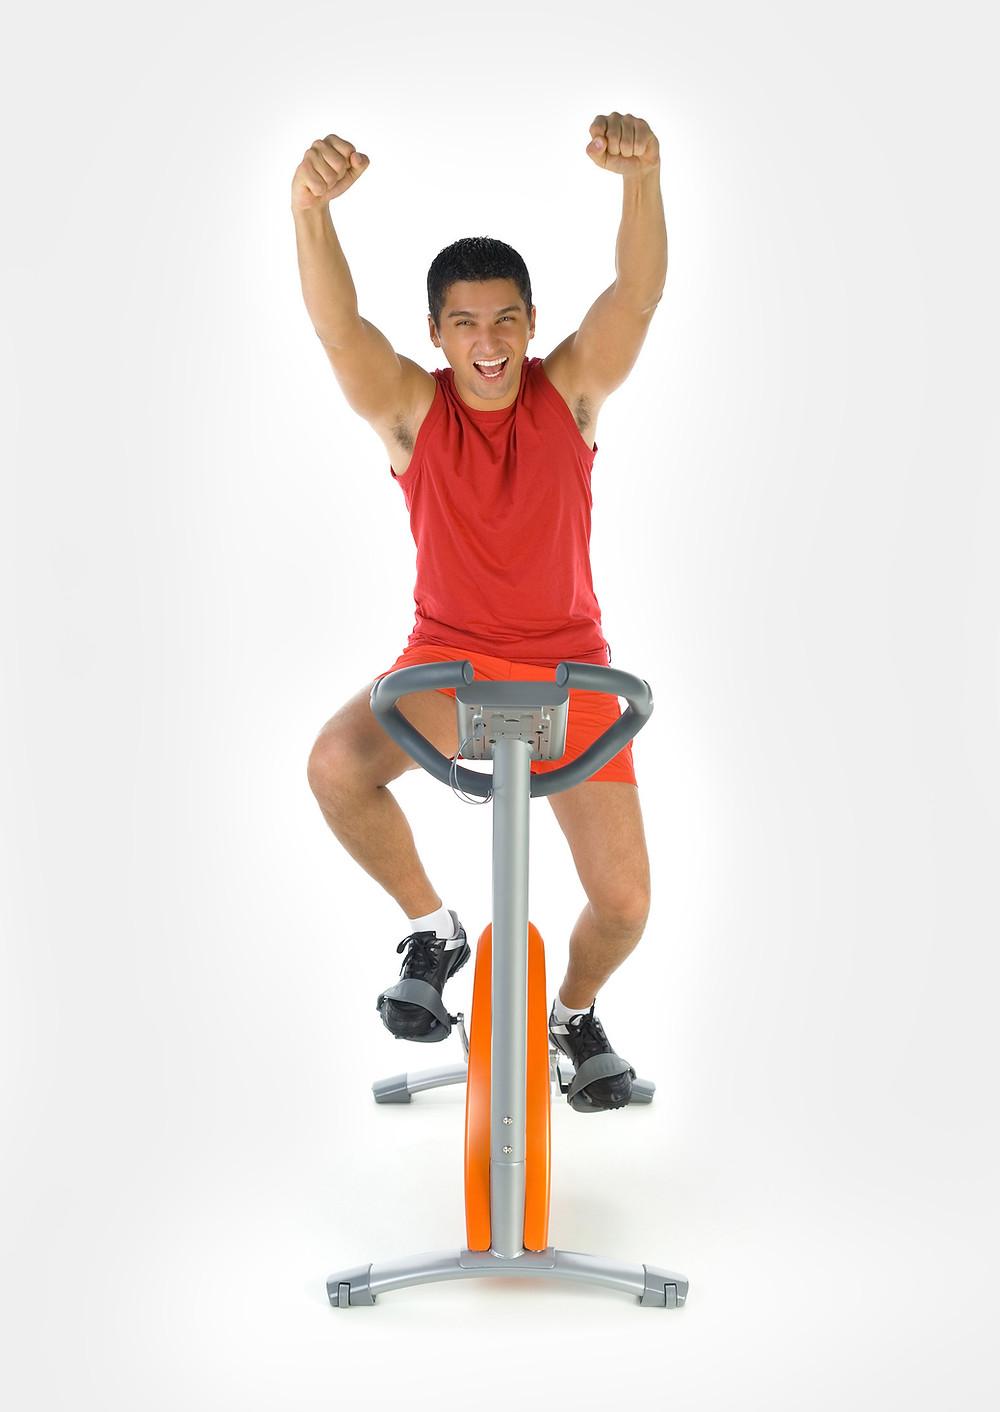 Enthusiastic man on a bike